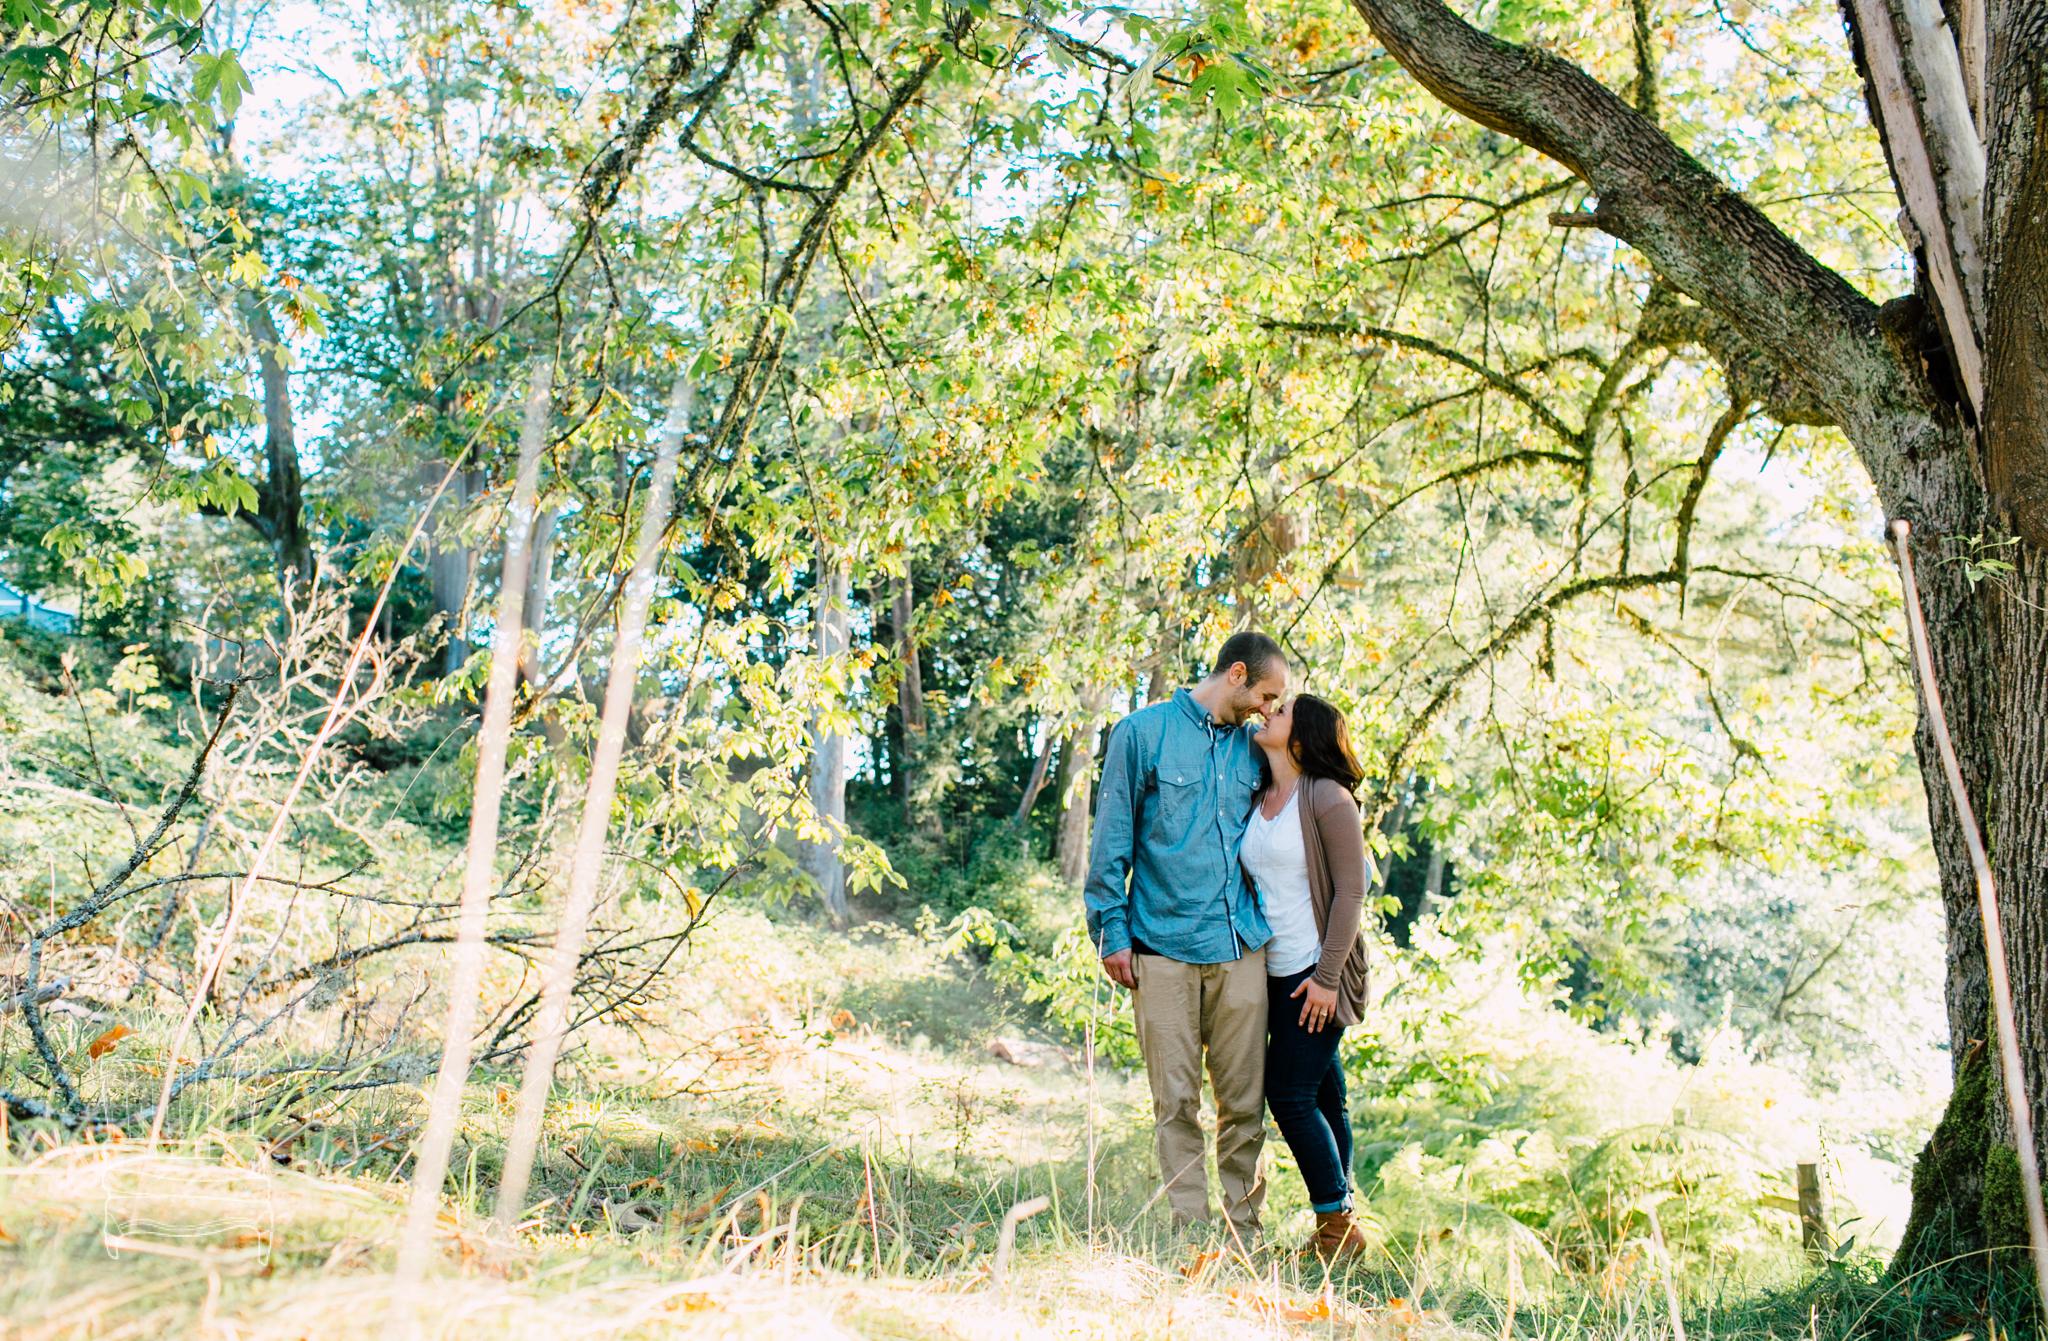 bellingham-woodstock-farm-engagement-katheryn-moran-photography-briannamark-3.jpg